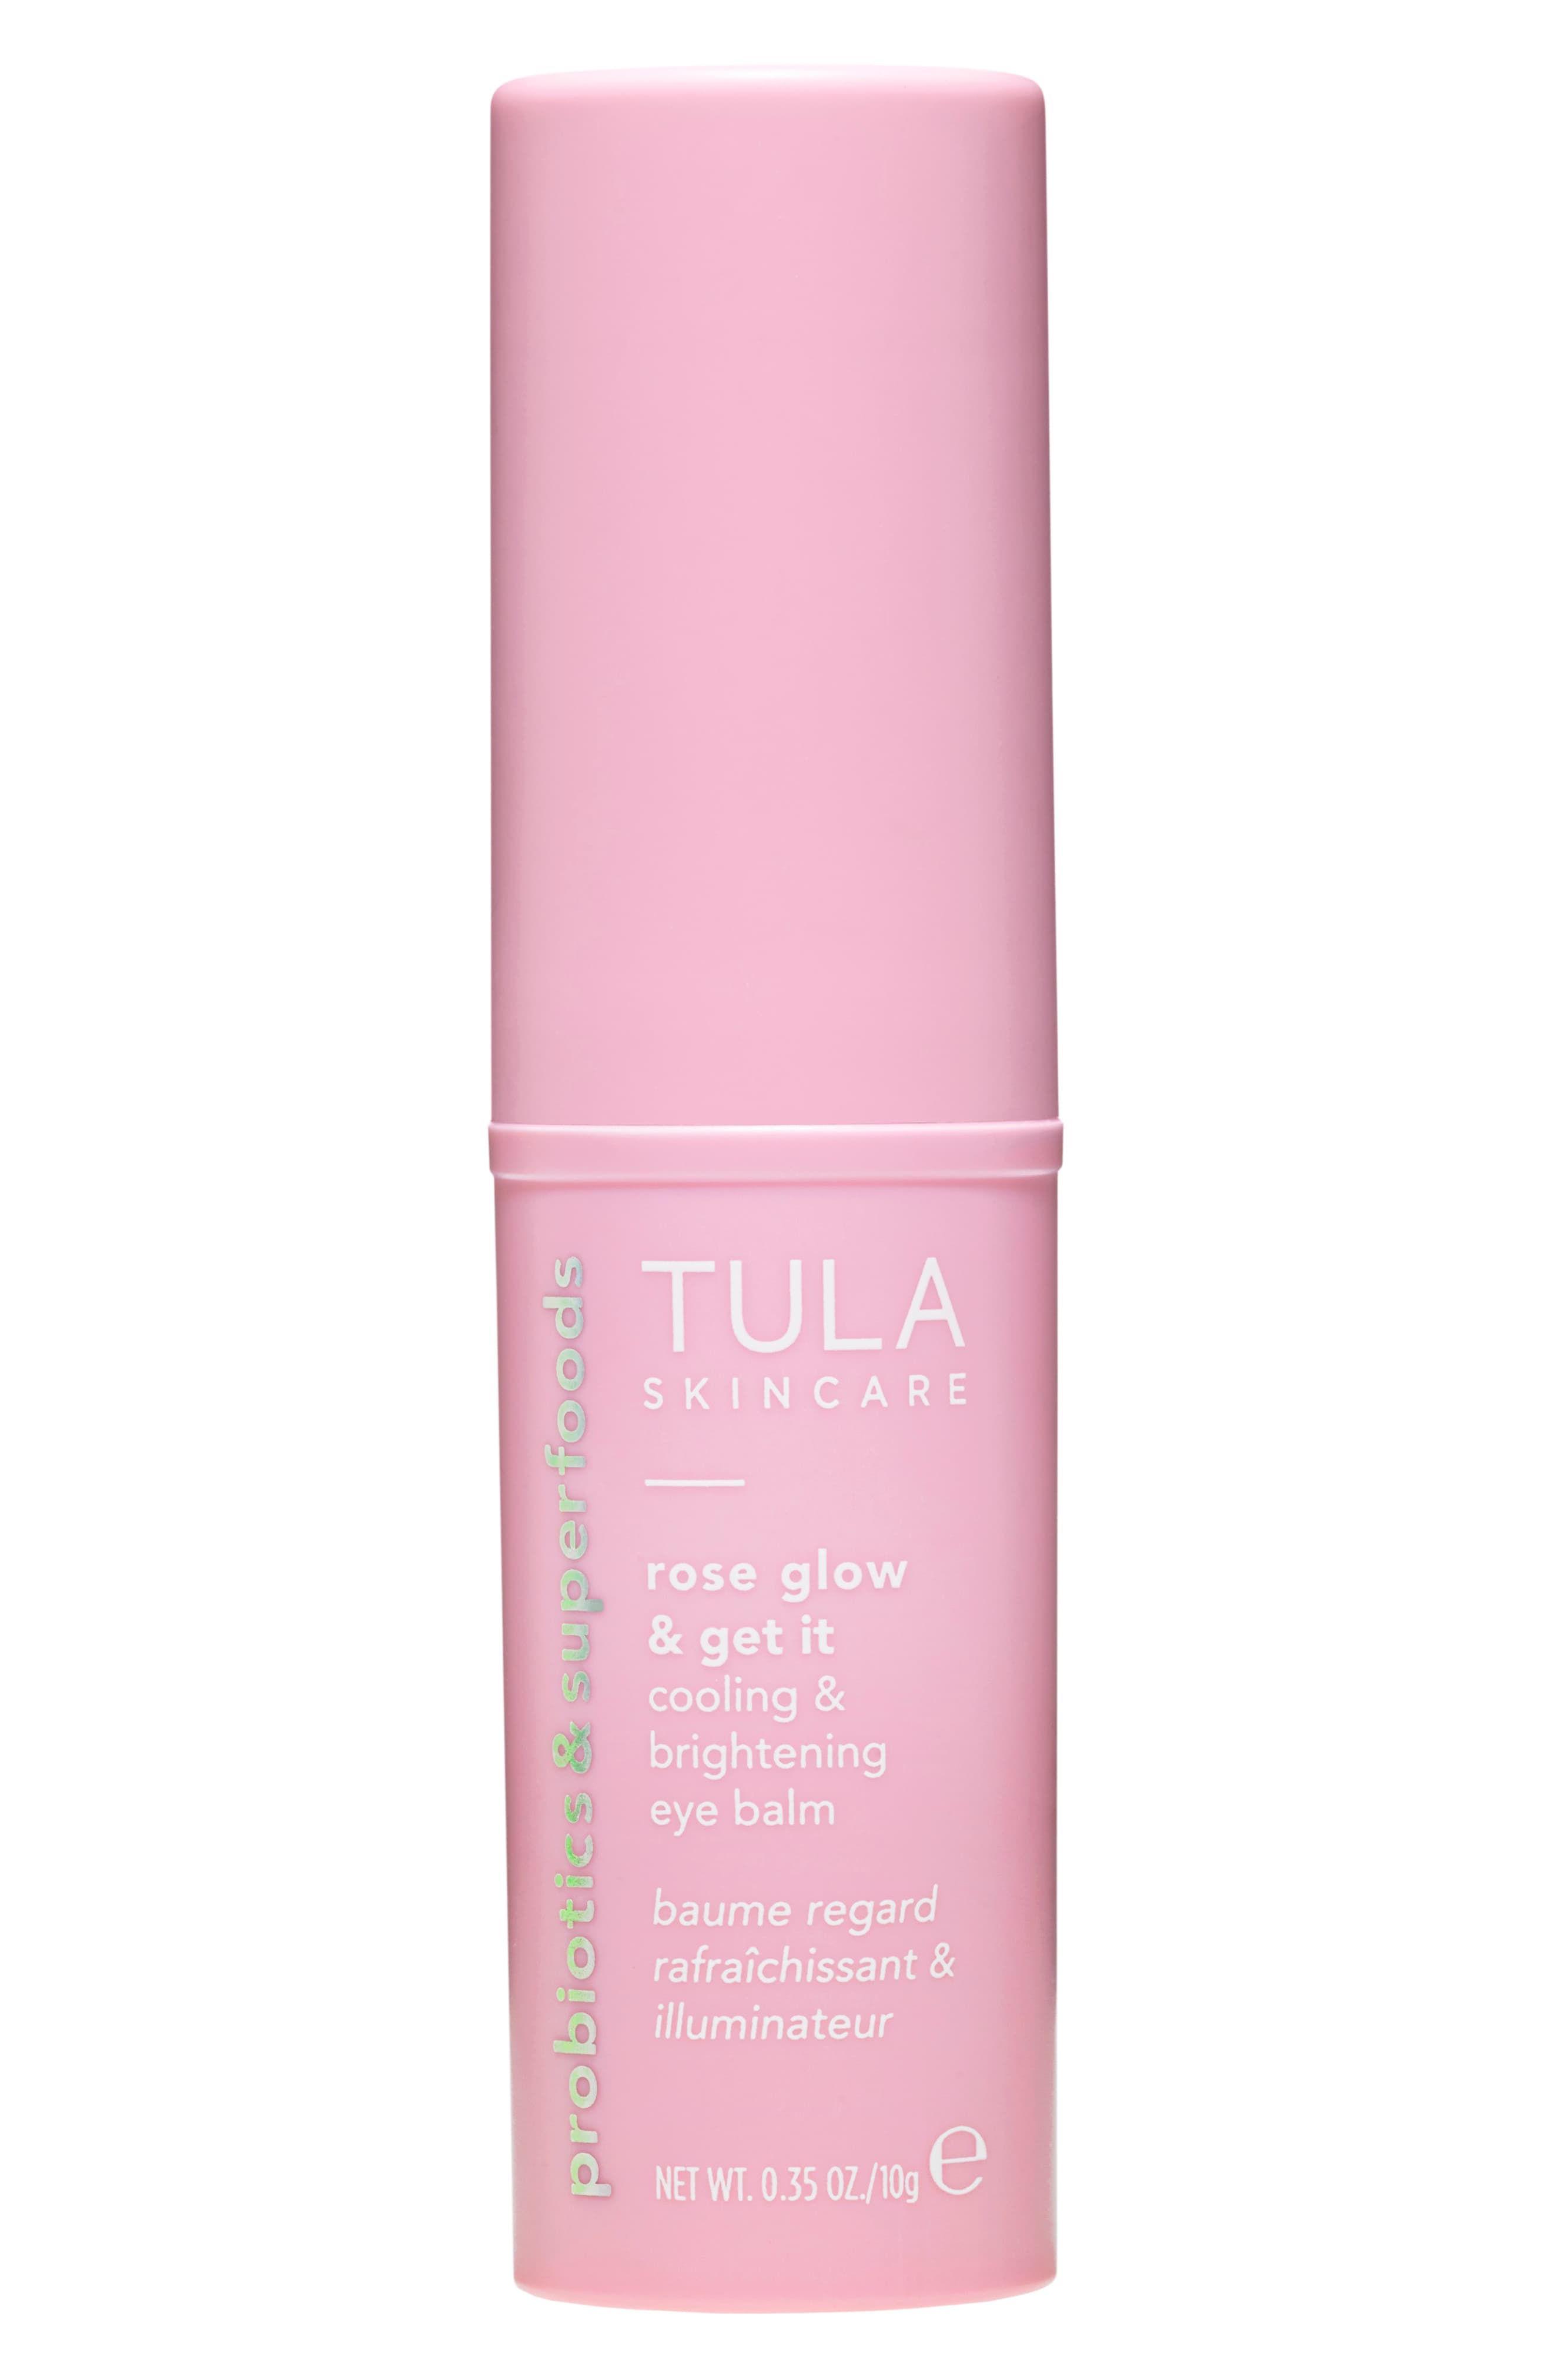 Tula Probiotic Skincare Rose Glow Get It Cooling Brightening